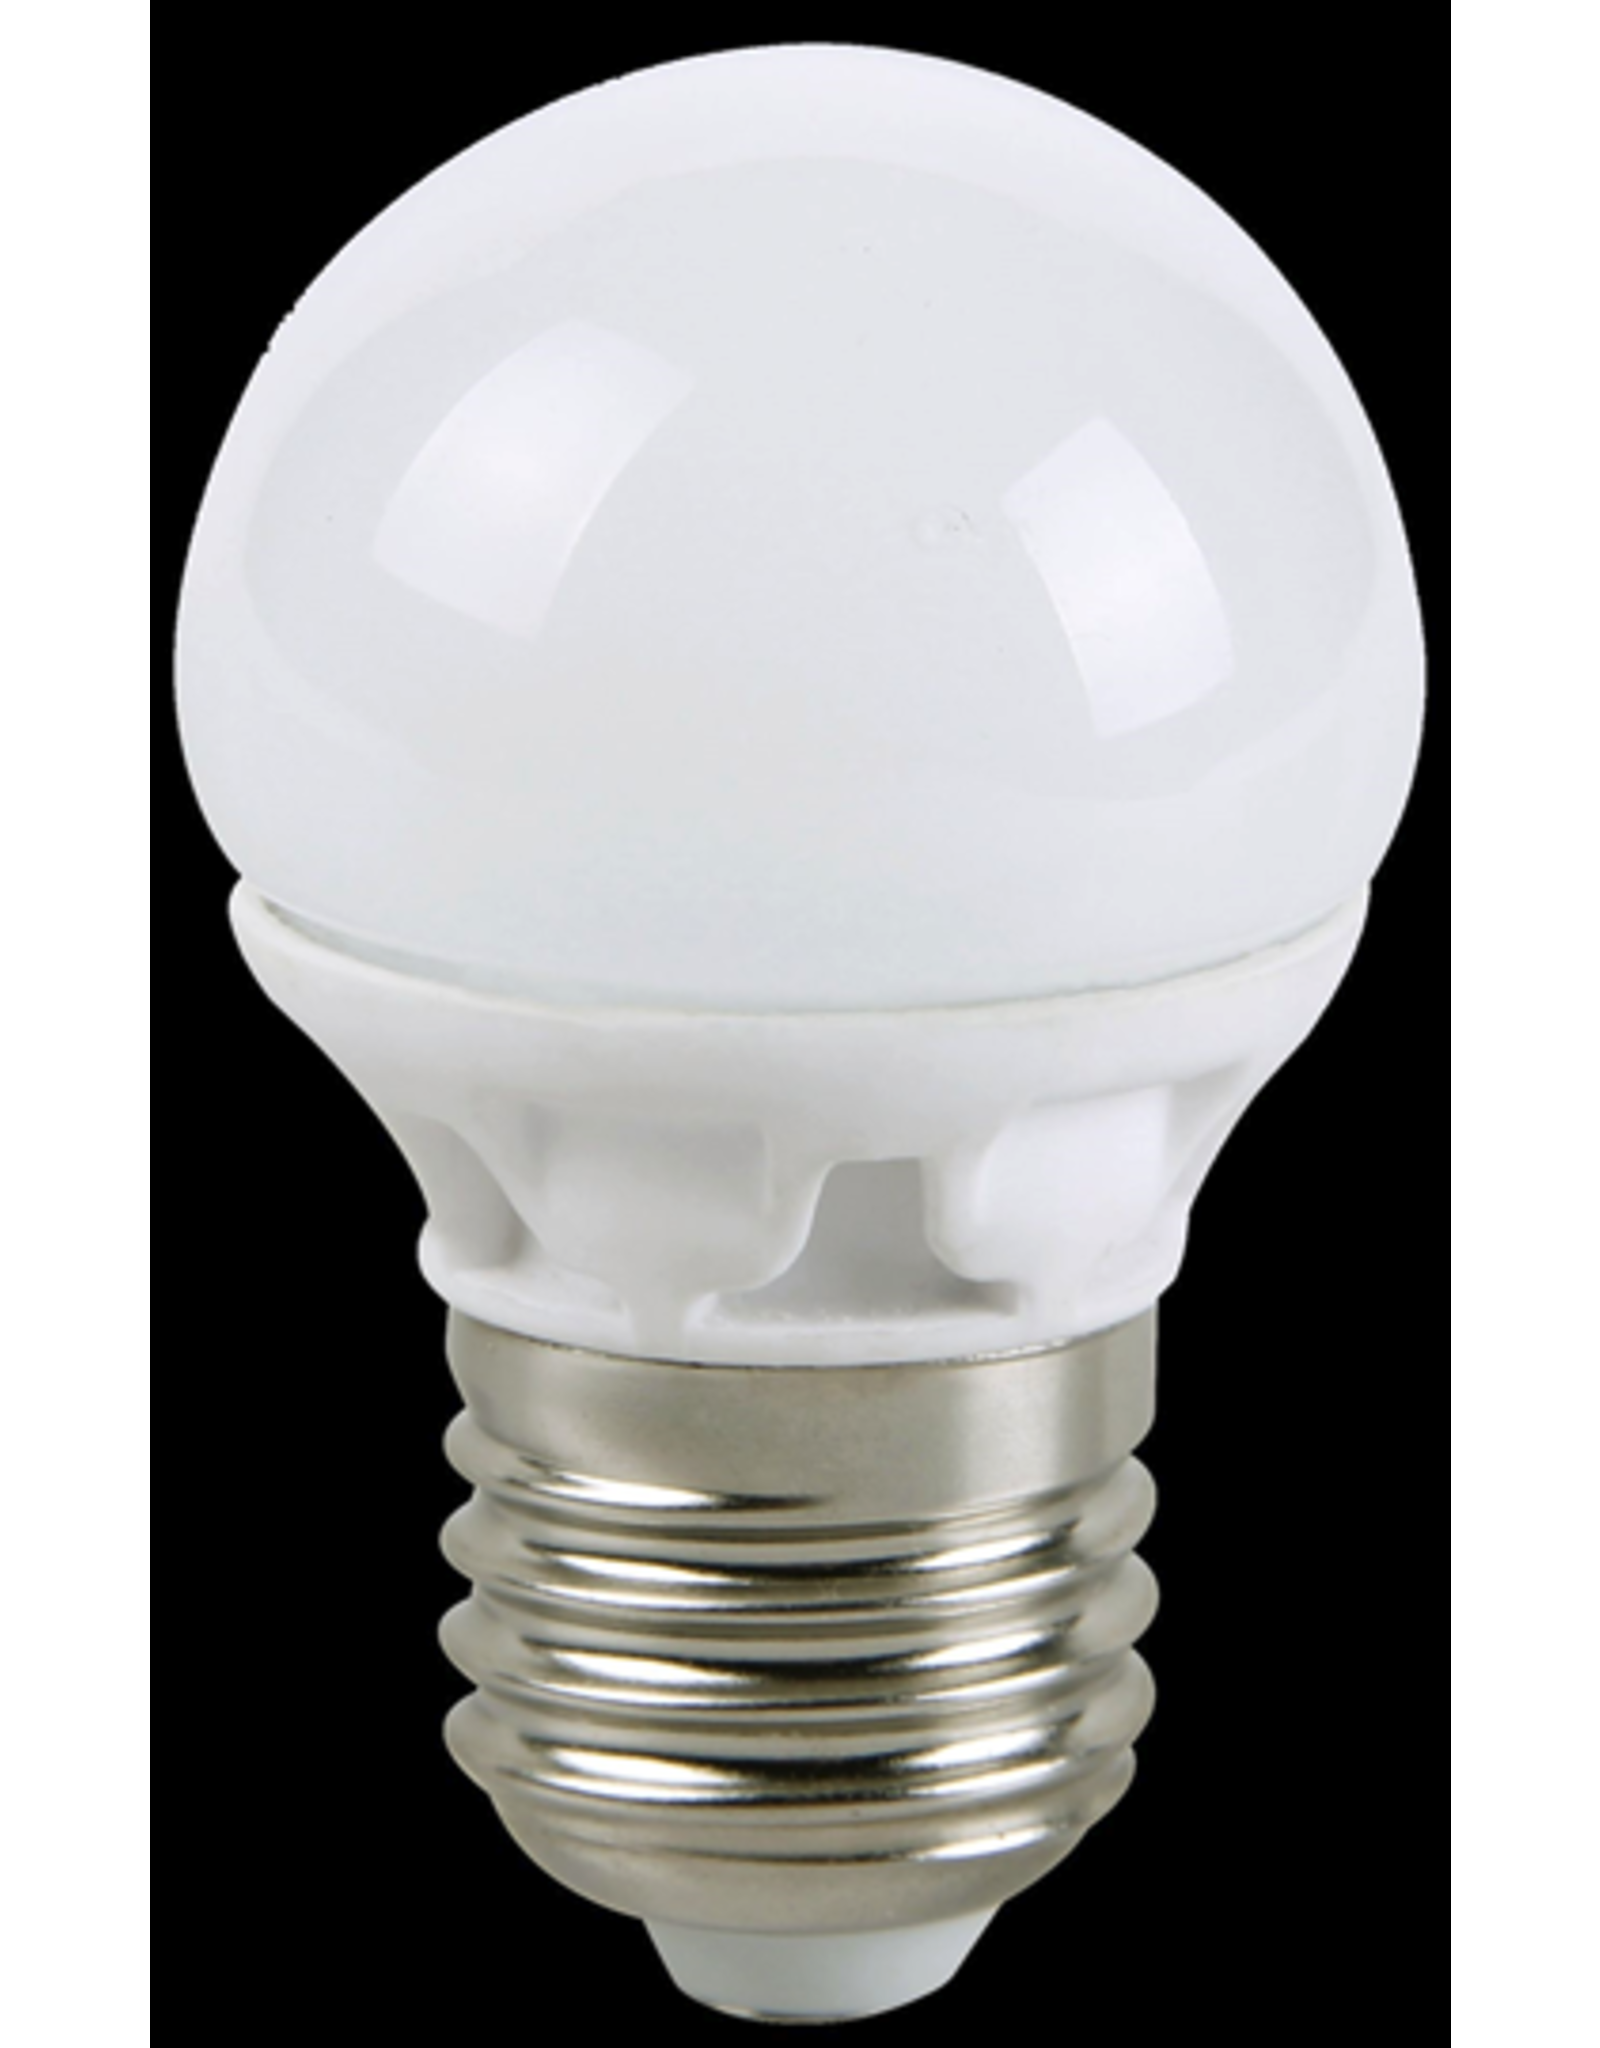 Led Bolvorm - grote fitting - niet dimbaar - warm wit - 25 -> 3 watt